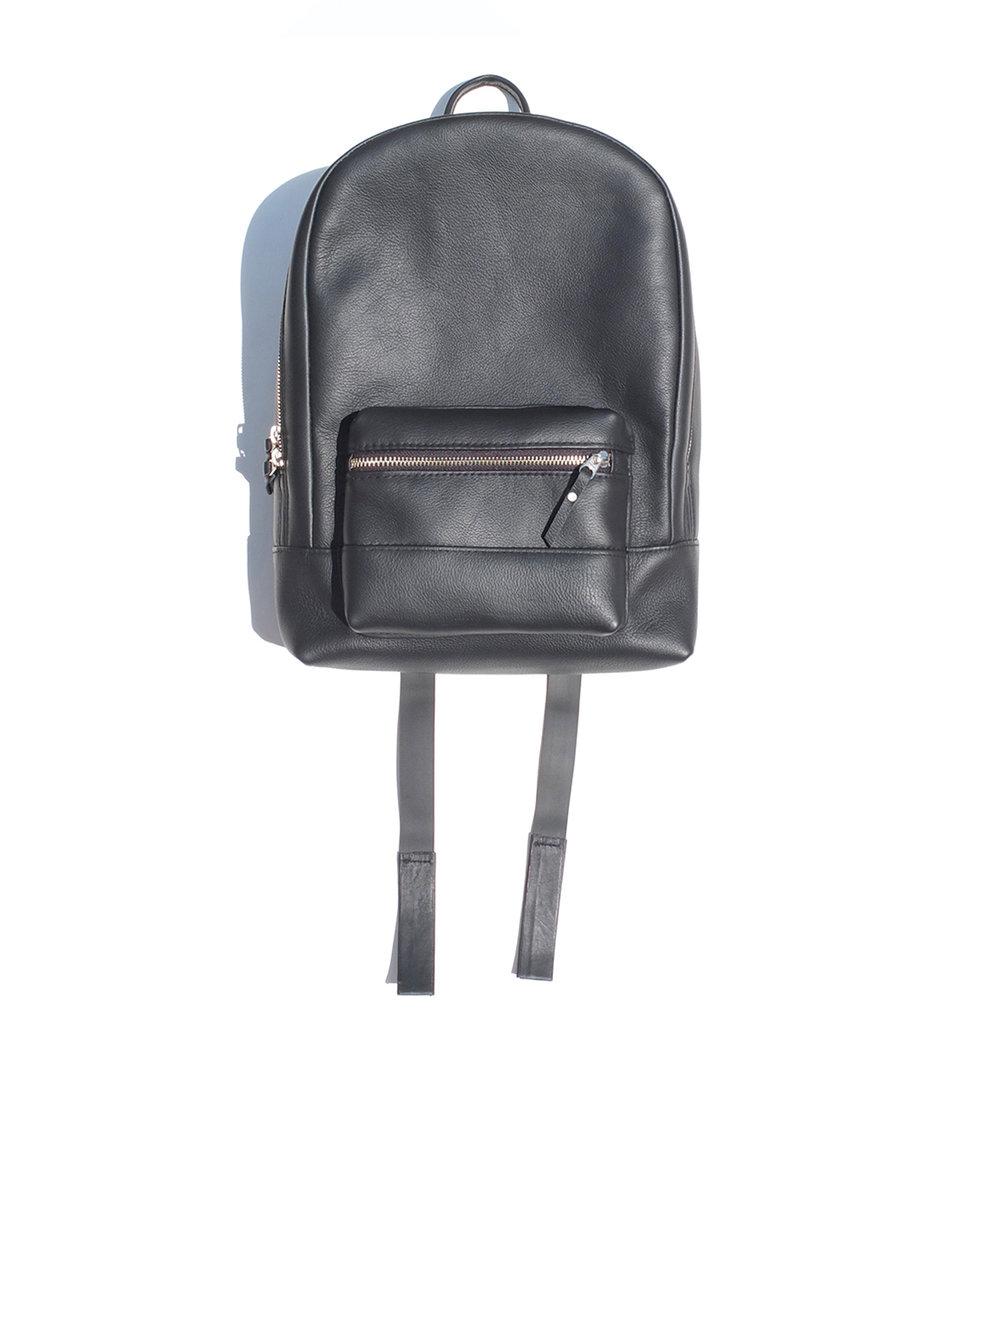 Rationale mini backpack - 280.00$